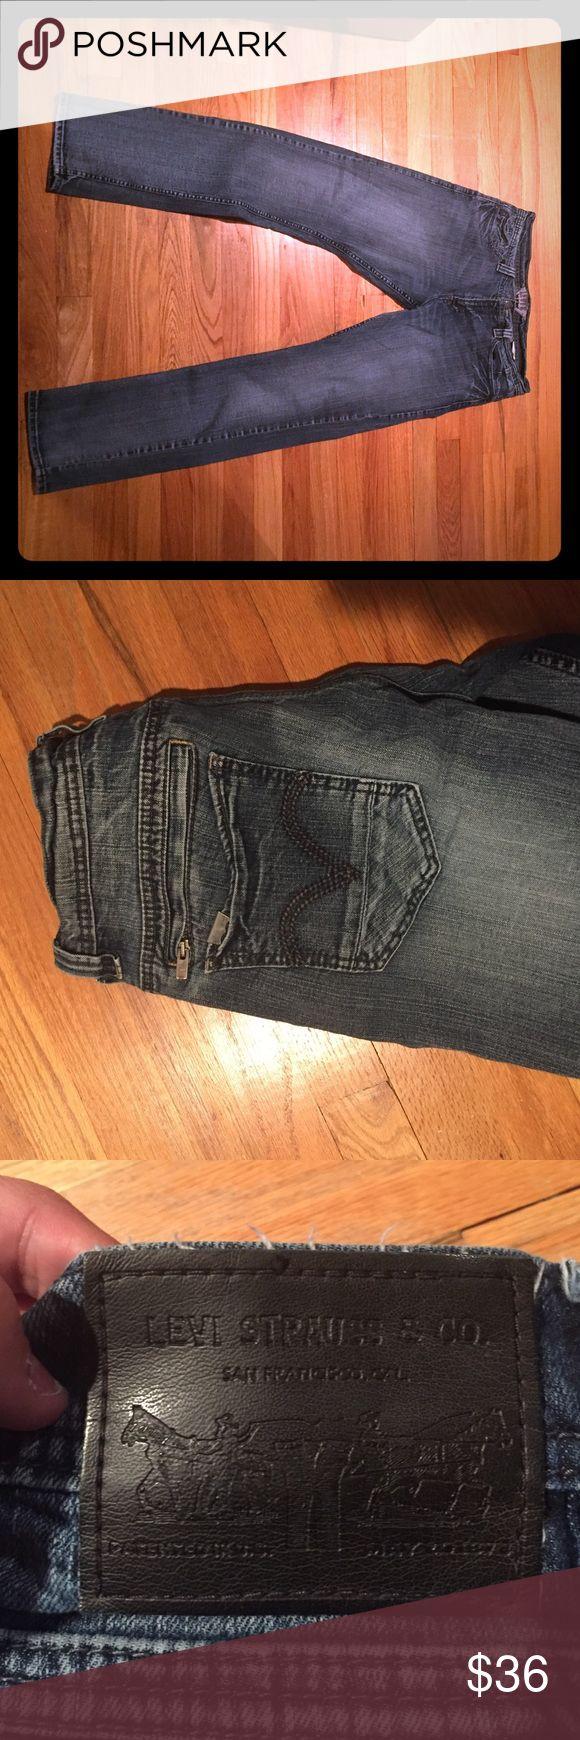 Levi 511 Men's skinny jeans size 33x32 Men's Levi size 33x32 511 skinny jeans Levi's Jeans Skinny